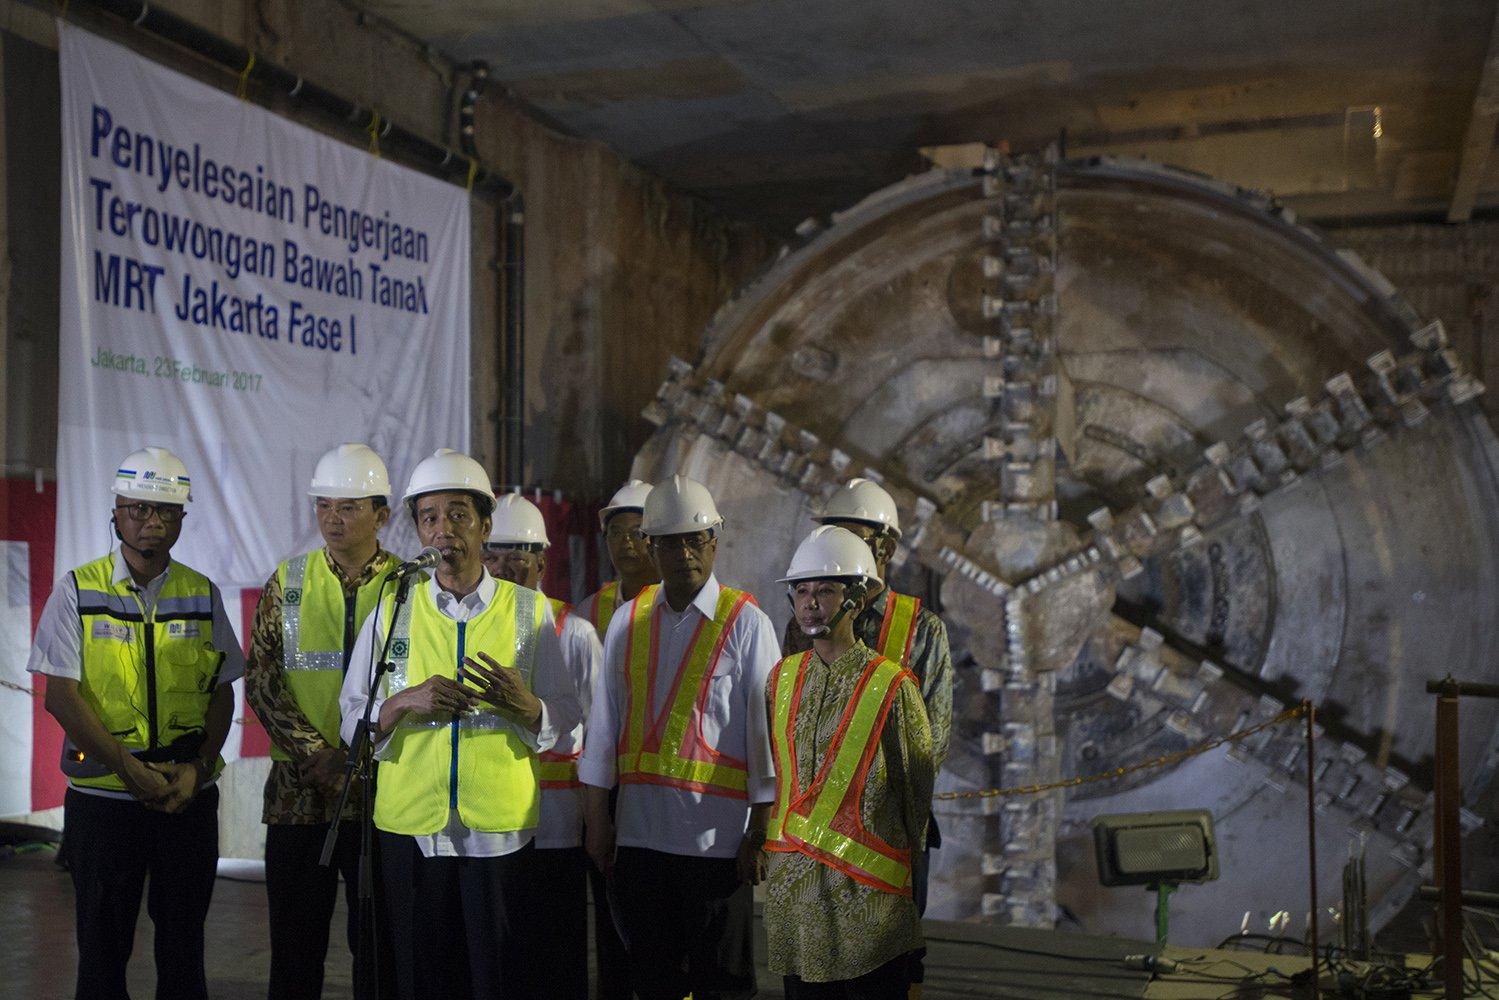 Presiden Joko Widodo (ketiga kiri) didampingi Menteri BUMN Rini Soemarno (kanan), Menteri Perhubungan Budi Karya (kedua kanan), Gubernur DKI Jakarta Basuki T. Purnama (kedua kiri) meninjau perkembangan proyek MRT di Jakarta, Kamis (23/2).